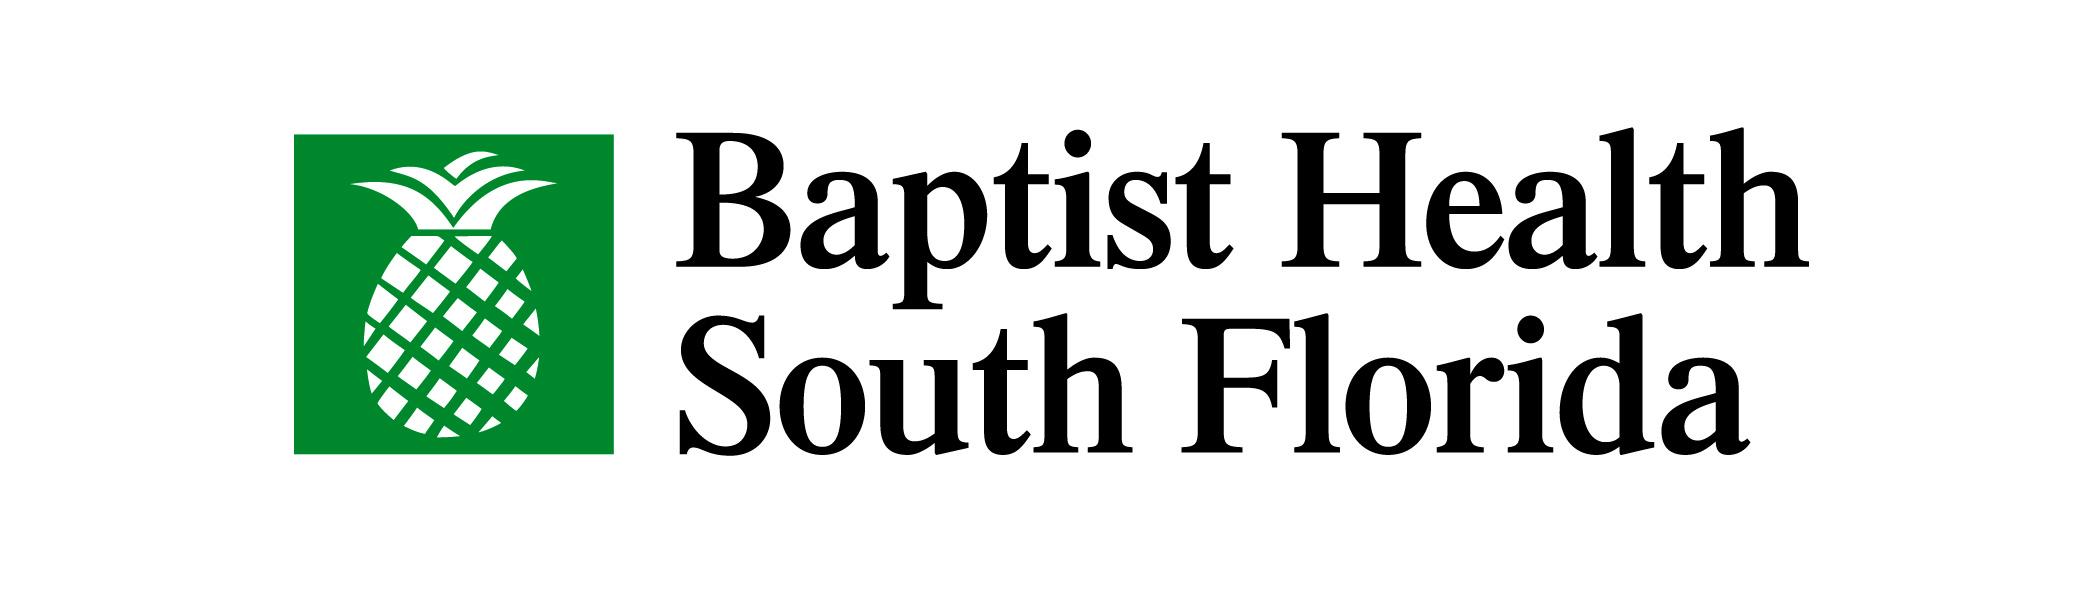 BHSF Logo_cmyk_stk.jpg